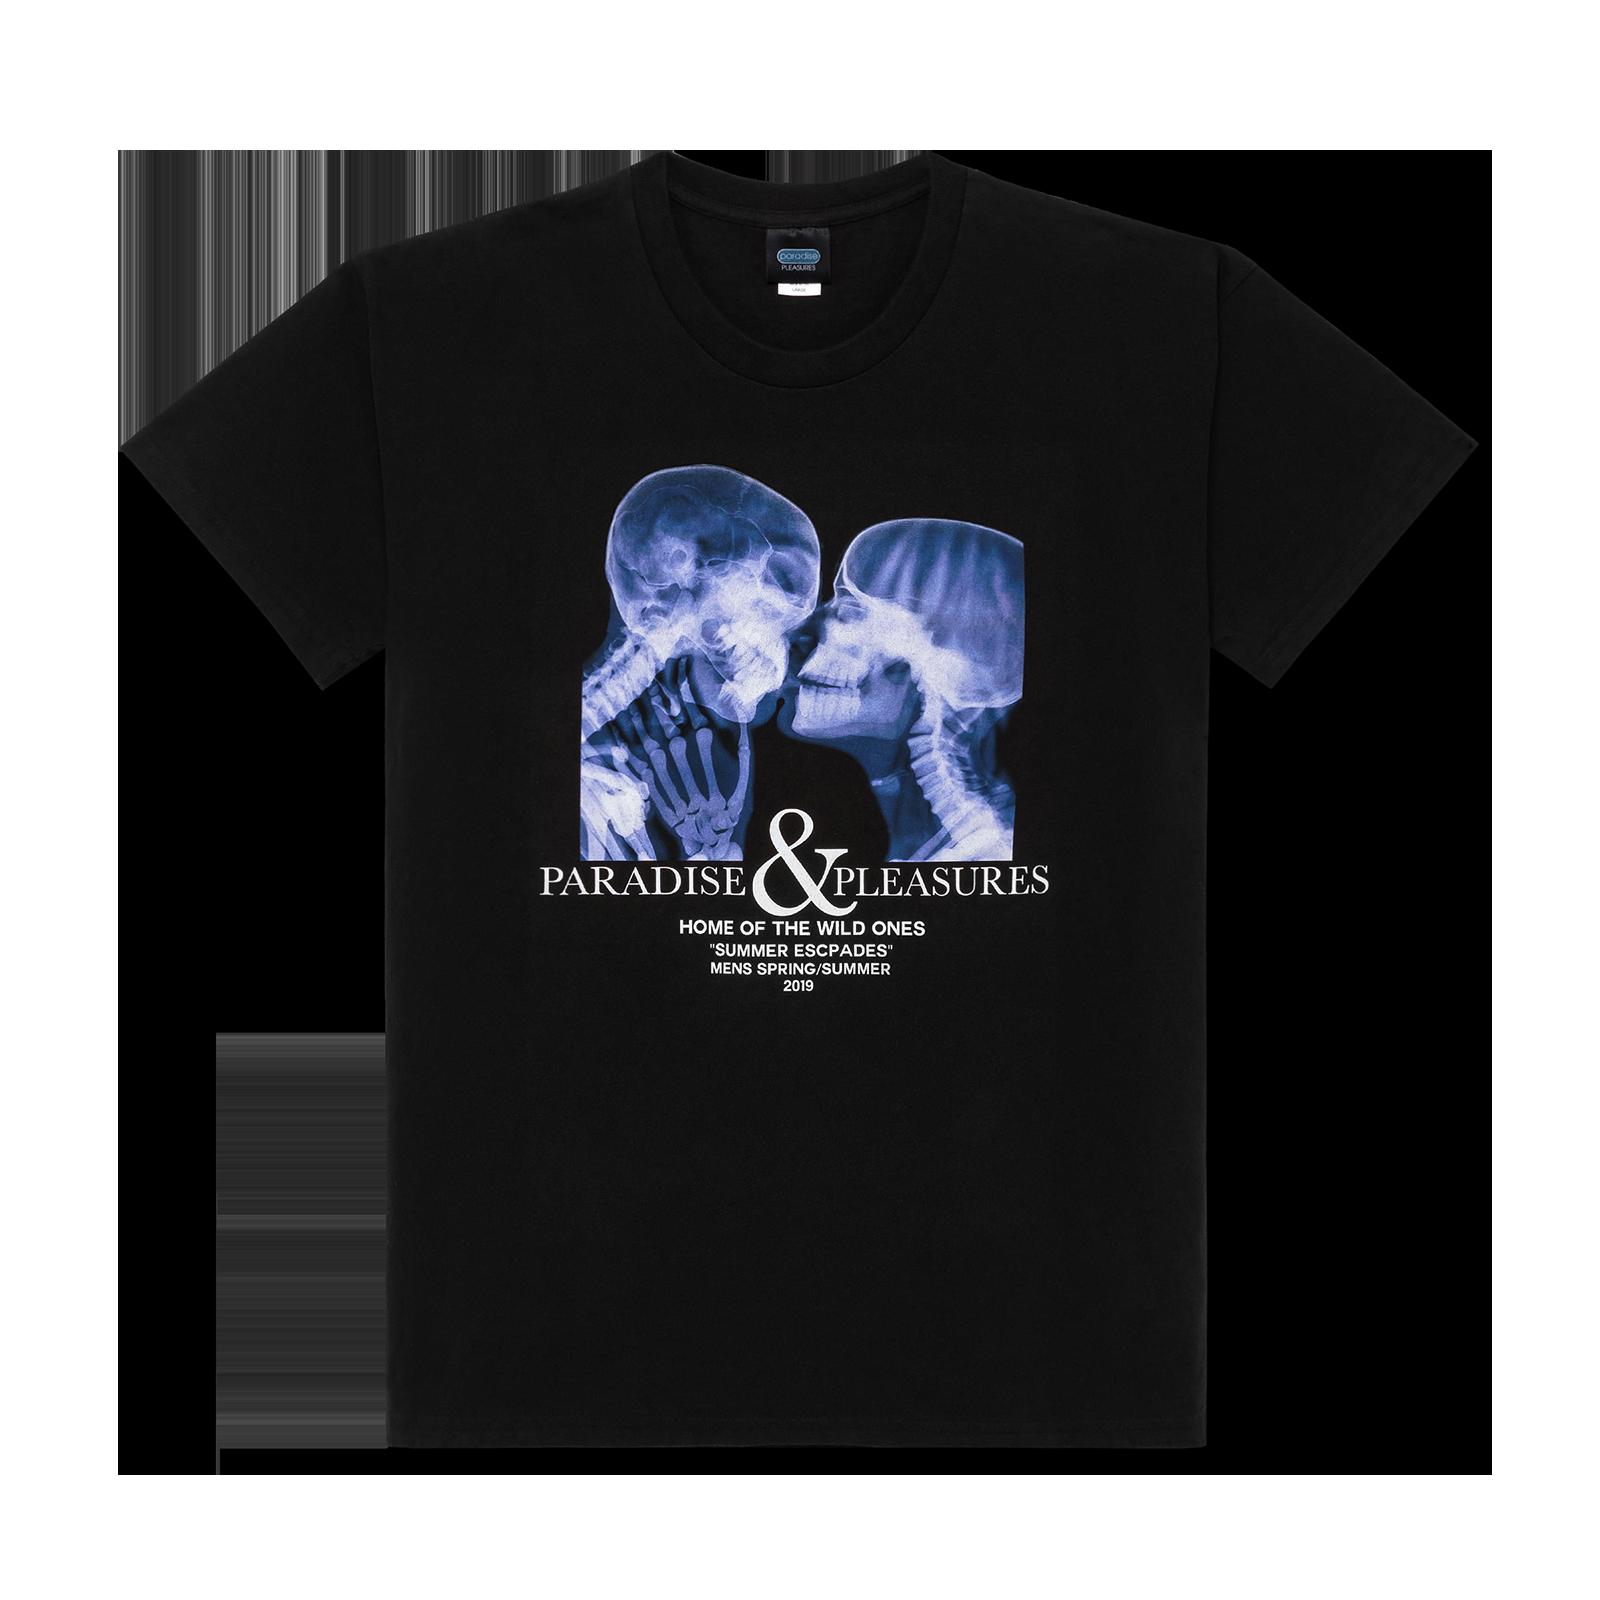 Flat lay t-shirt product image